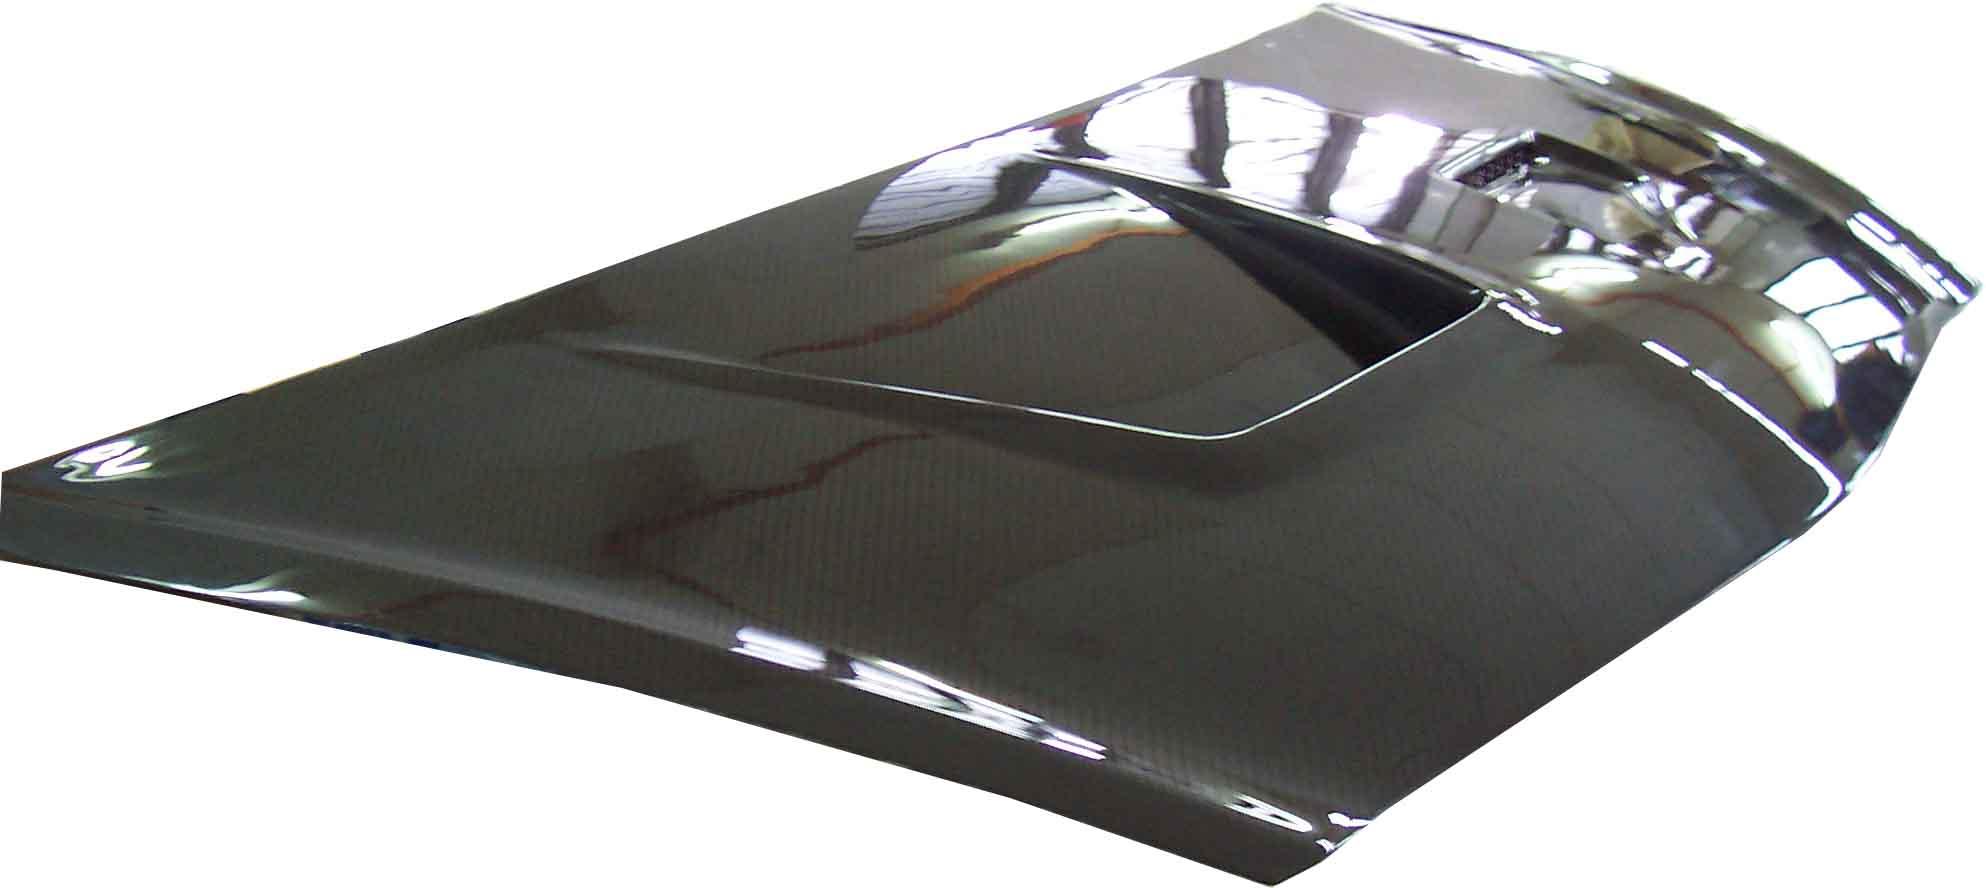 Carbon Fiber Parts Manufacturer